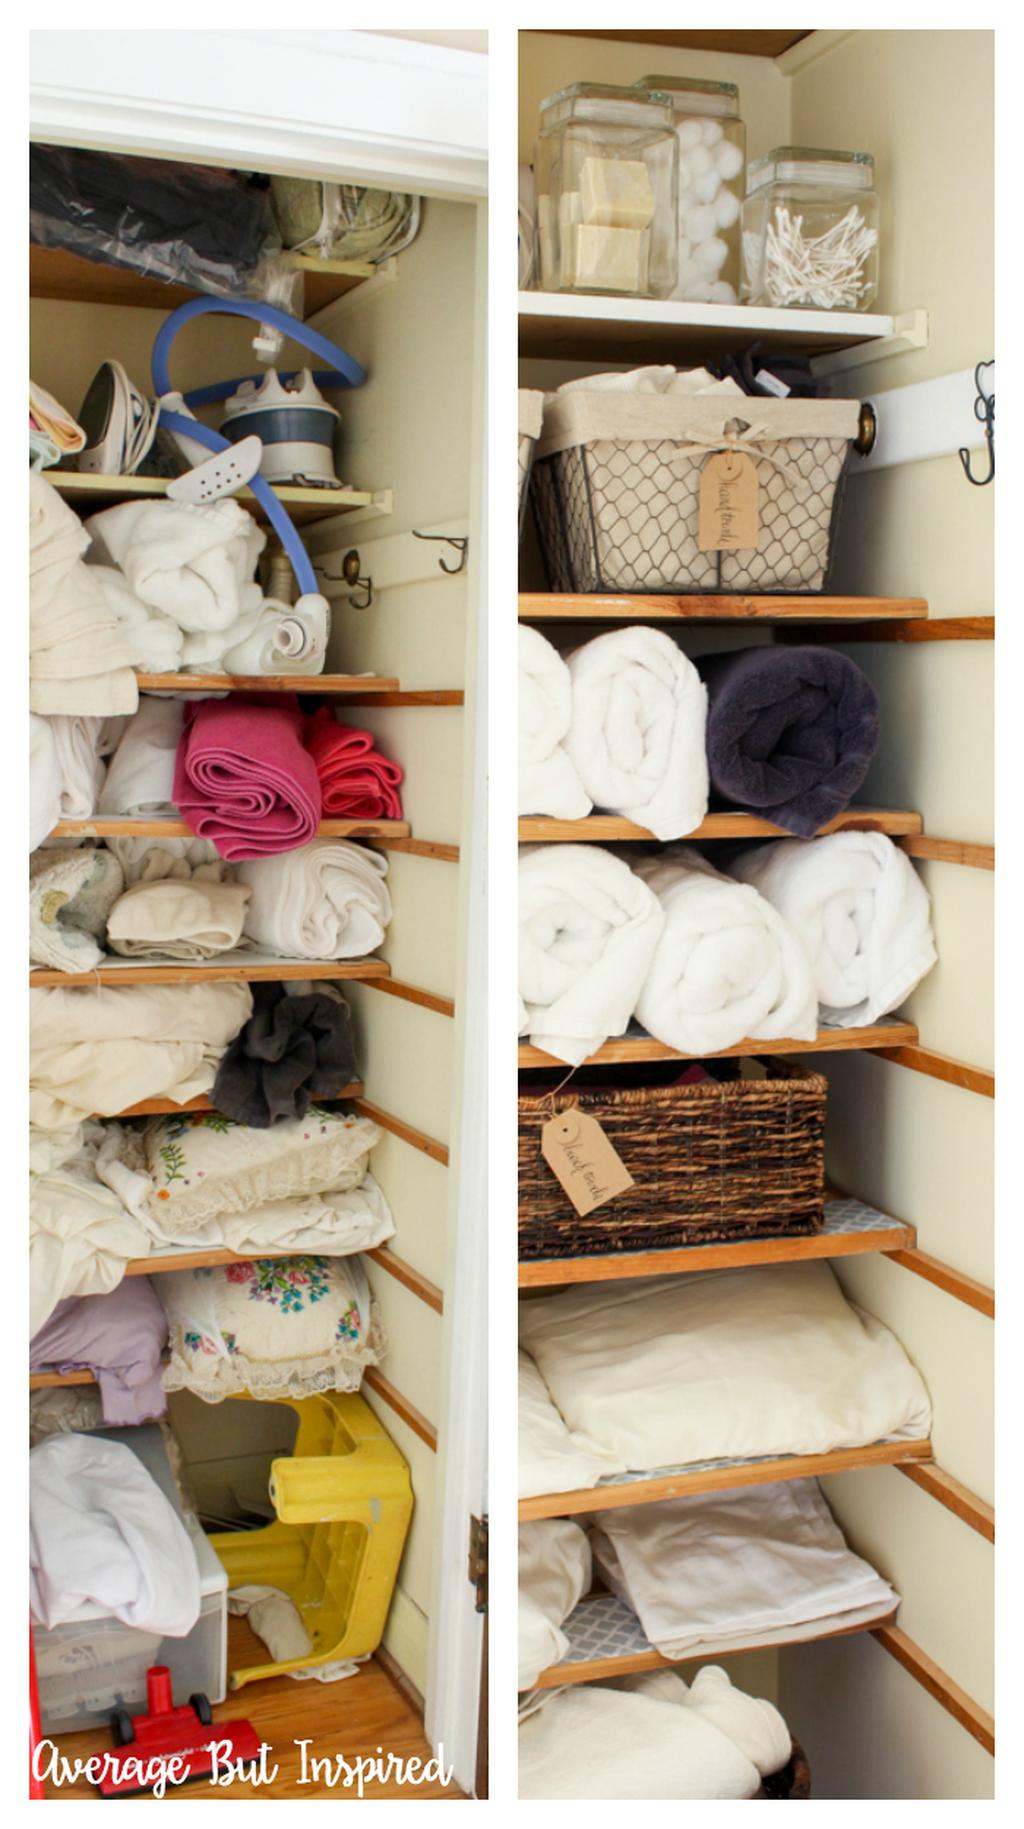 42 the best crafty closet organization ideas to apply asap - trenduhome in 2020 | linen closet